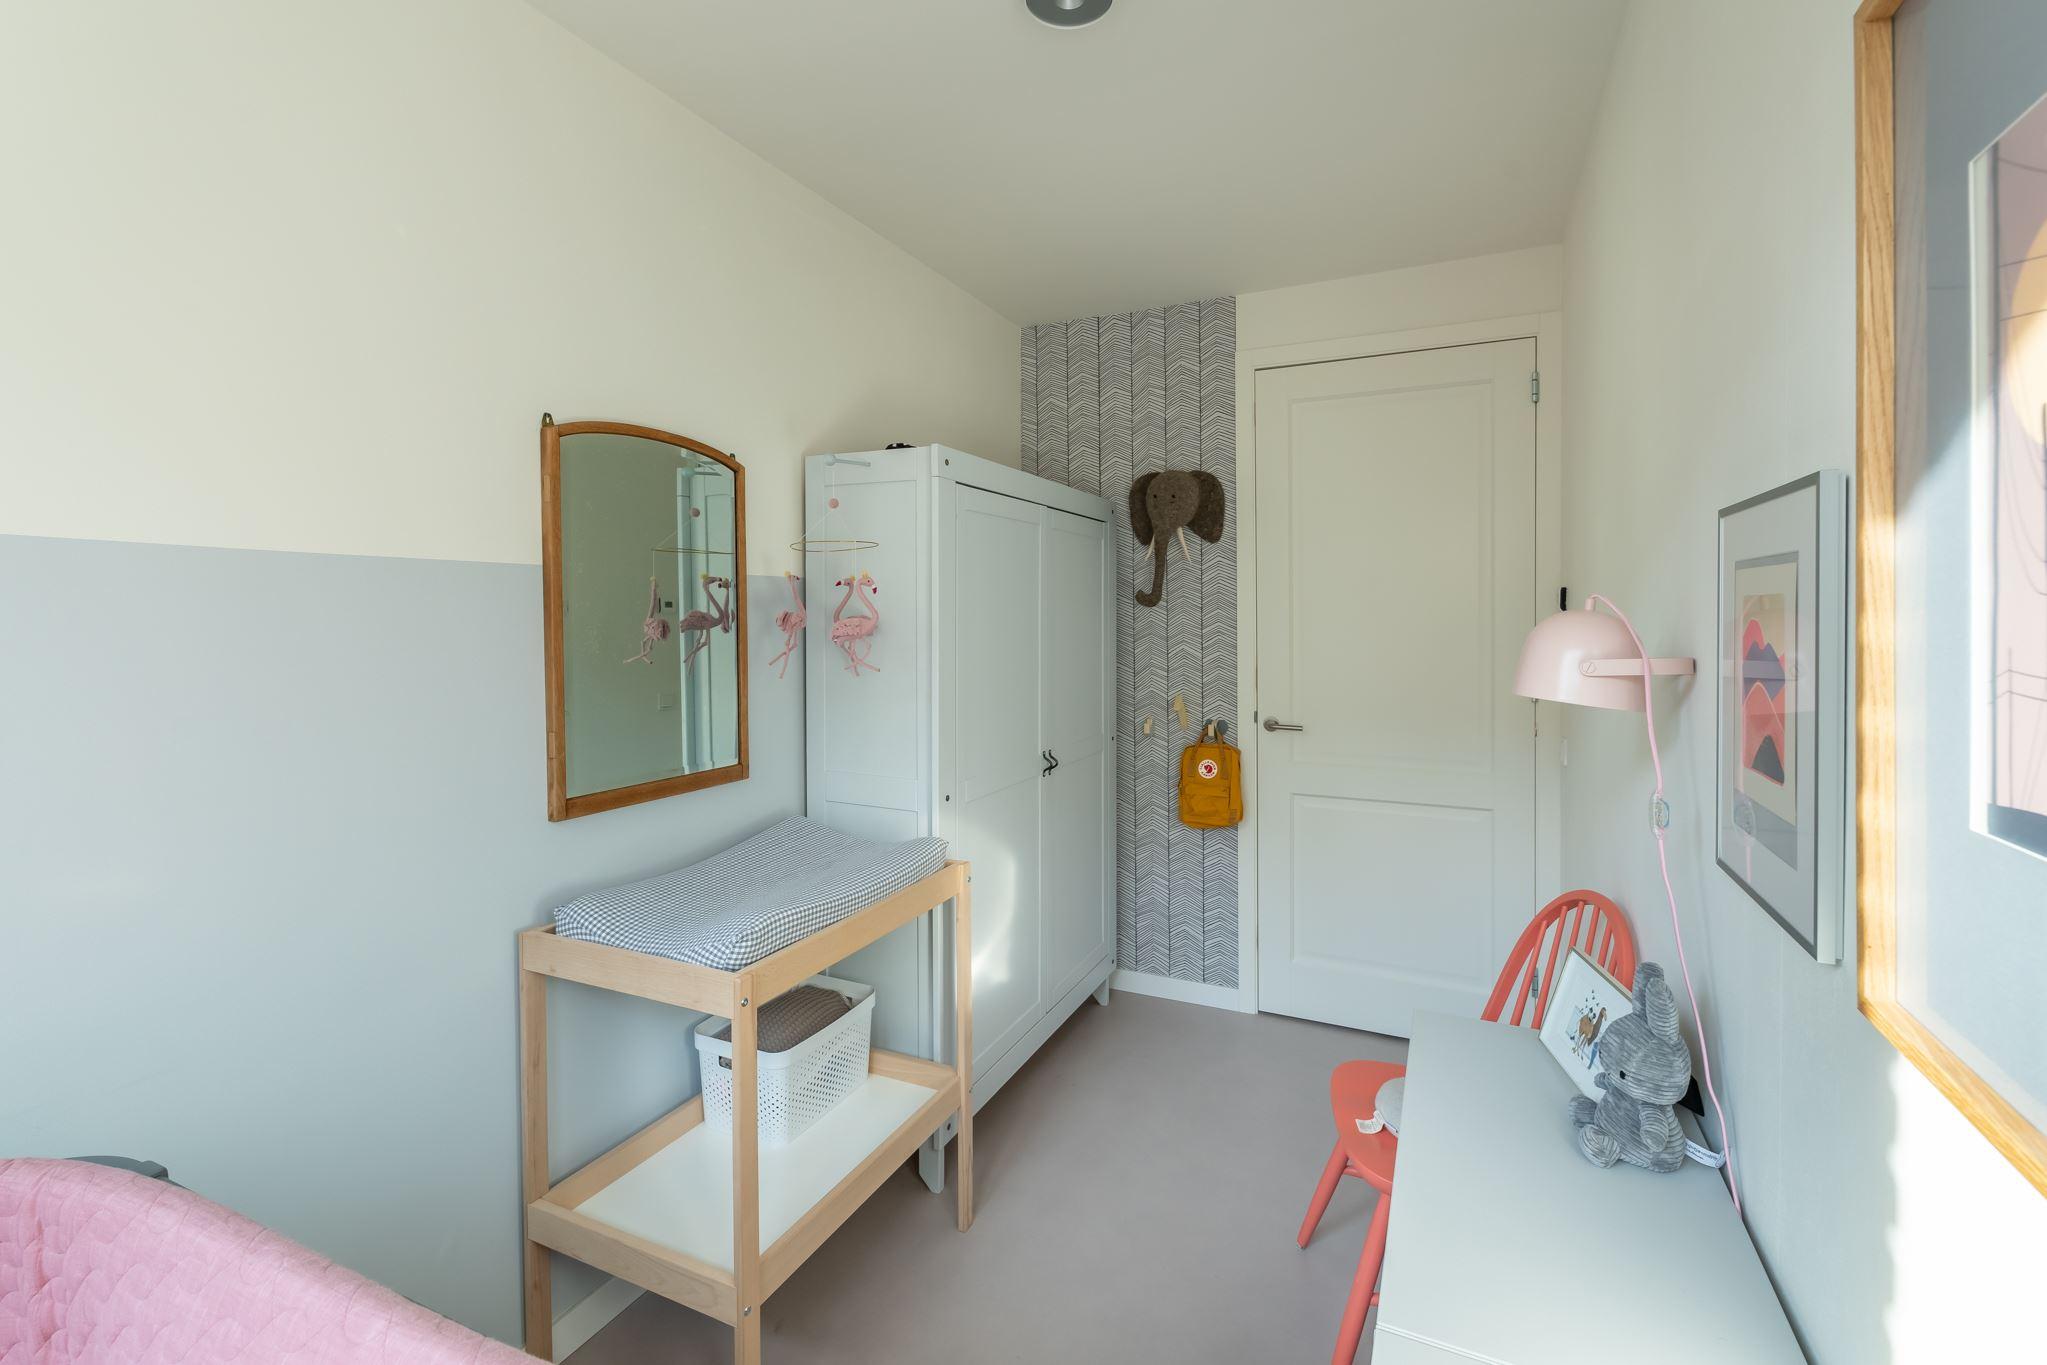 Zonwering Slaapkamer 51 : Appartement te koop: oostenburgervoorstraat 51 c 1018 mn amsterdam